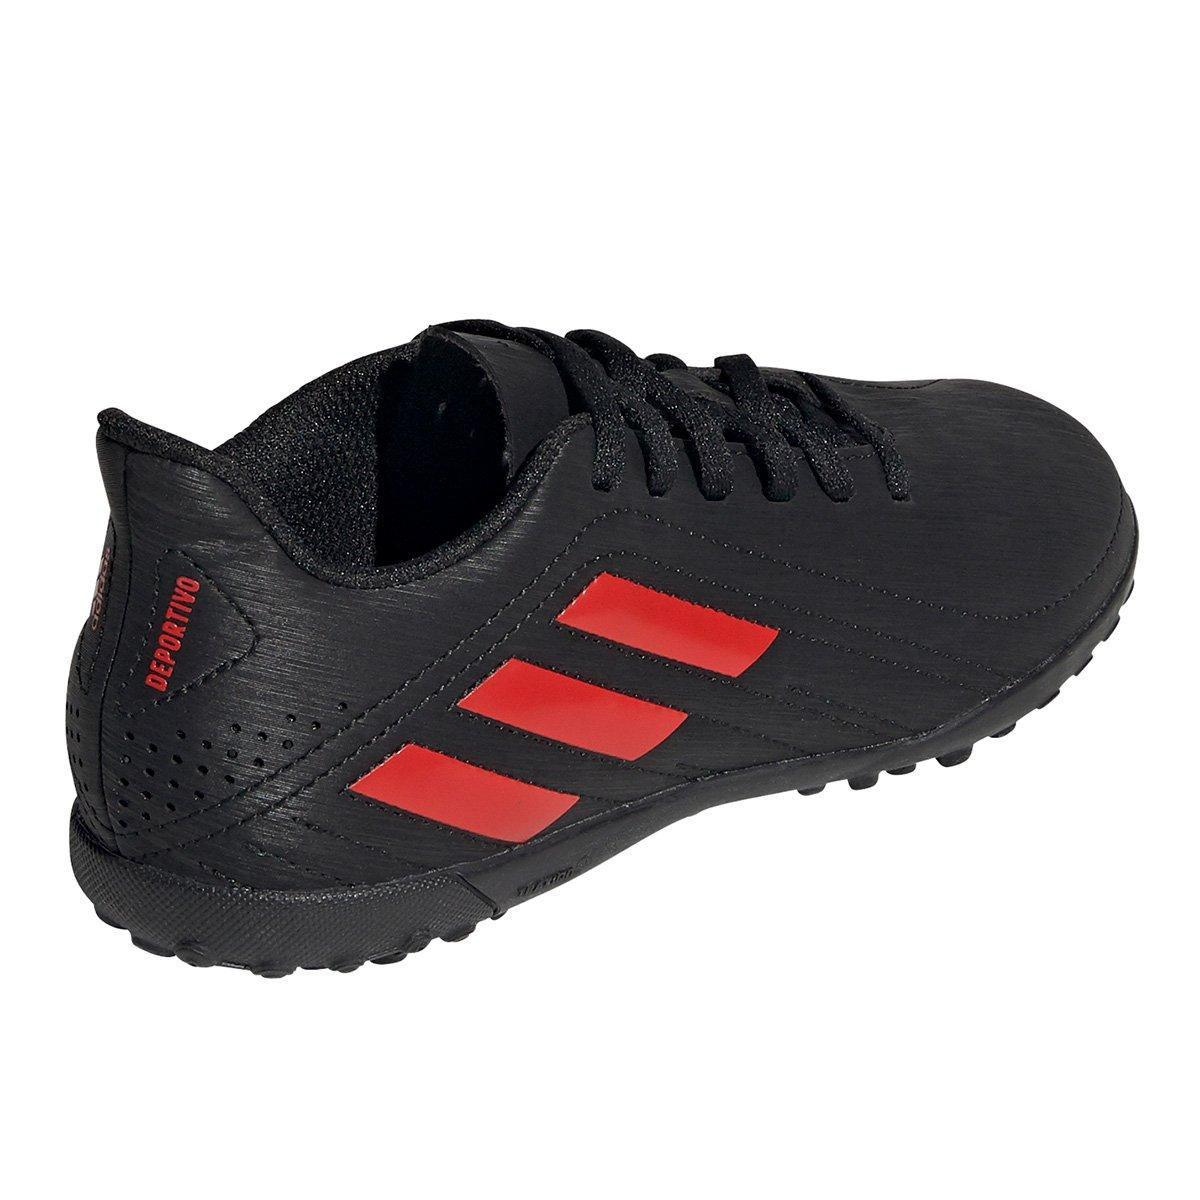 Chuteira Menino Adidas Infantil Desportivo